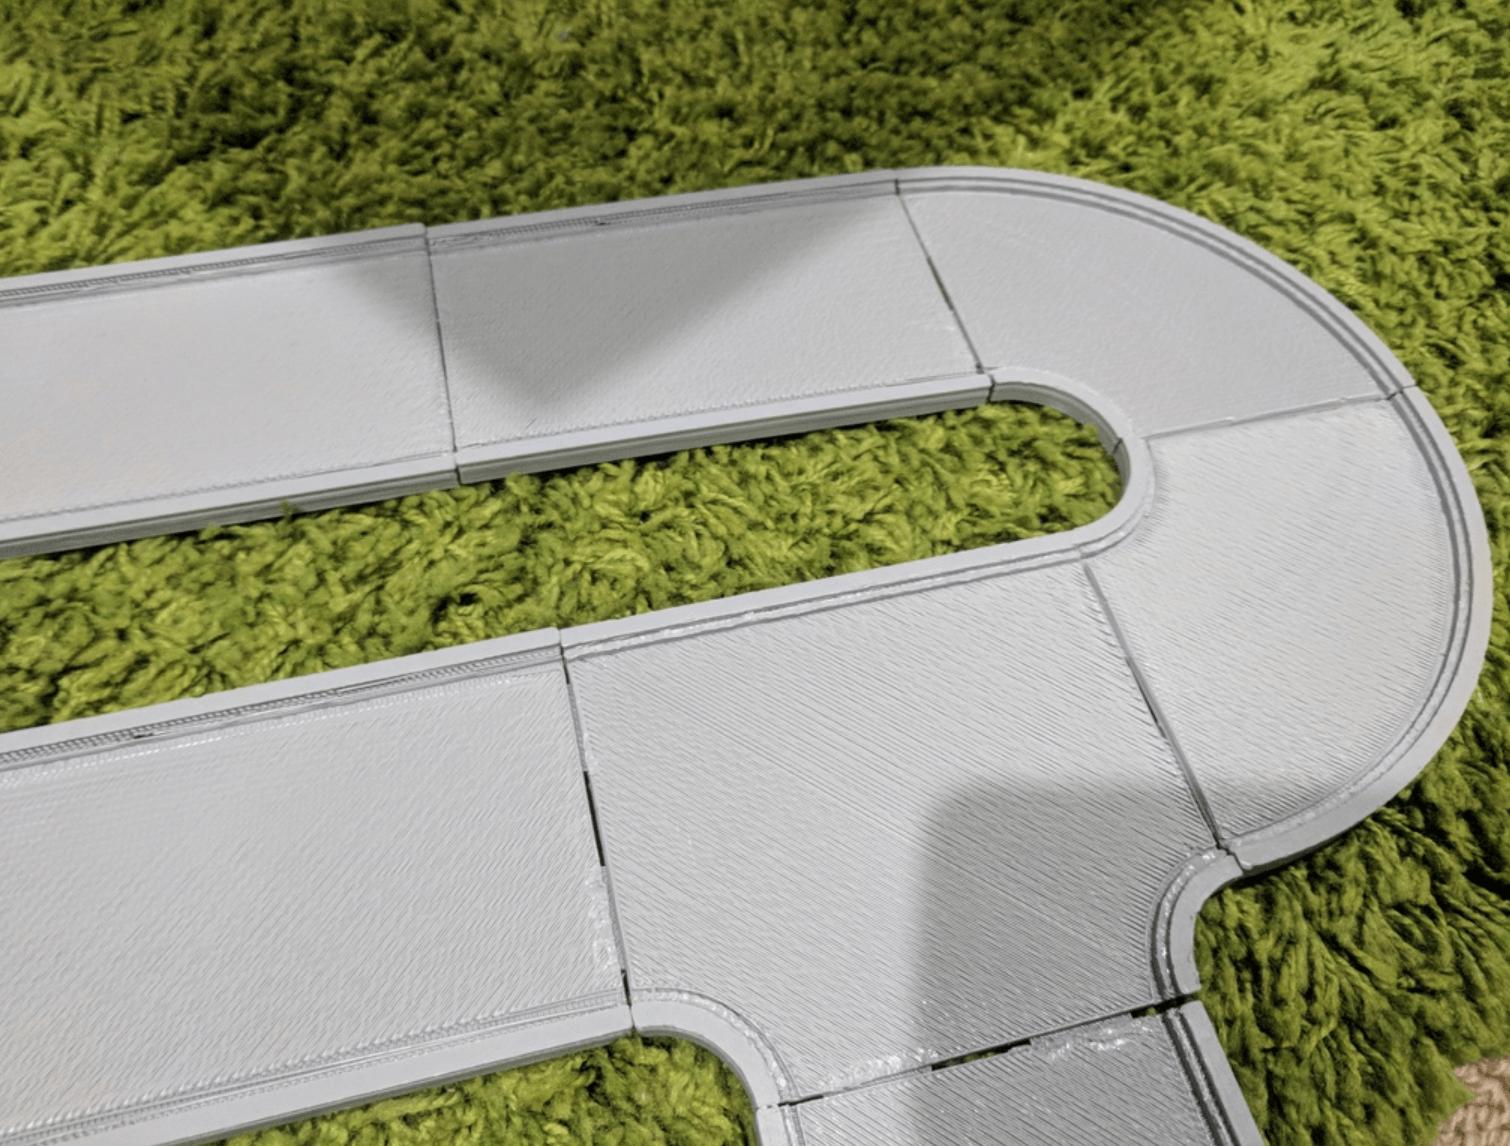 Capture d'écran 2018-05-14 à 15.19.51.png Download free STL file Press Fit Hotwheels Roads • Model to 3D print, sjpiper145